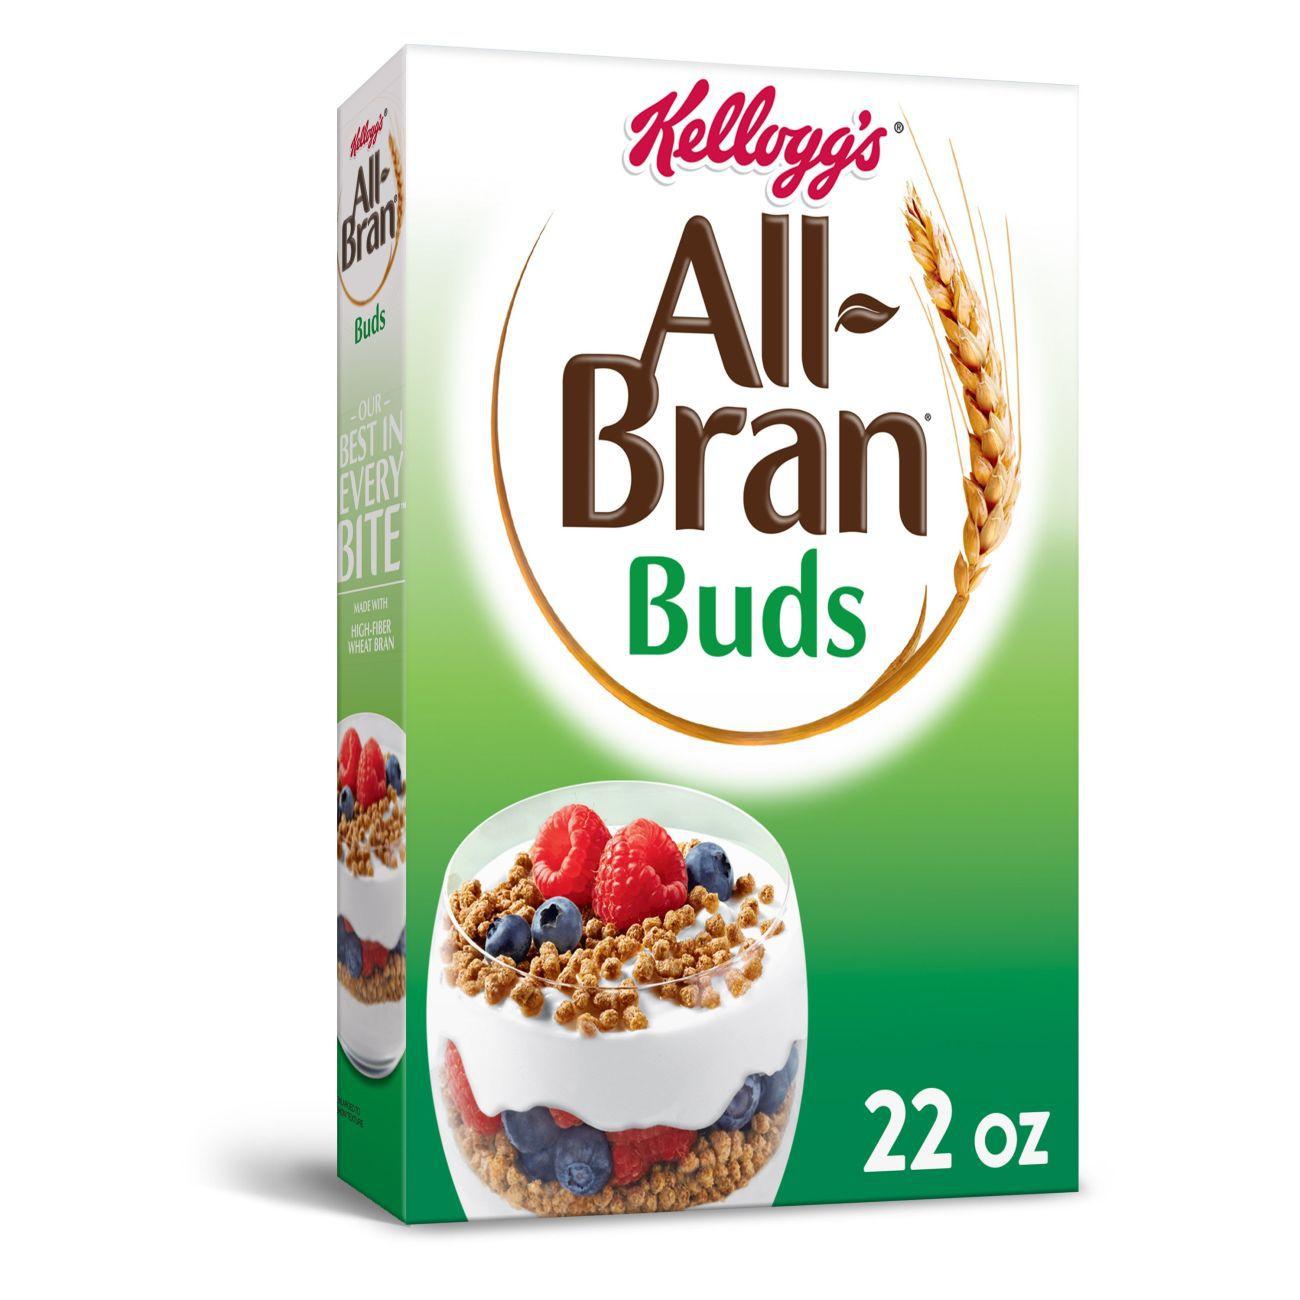 Kellogg's All Bran Buds